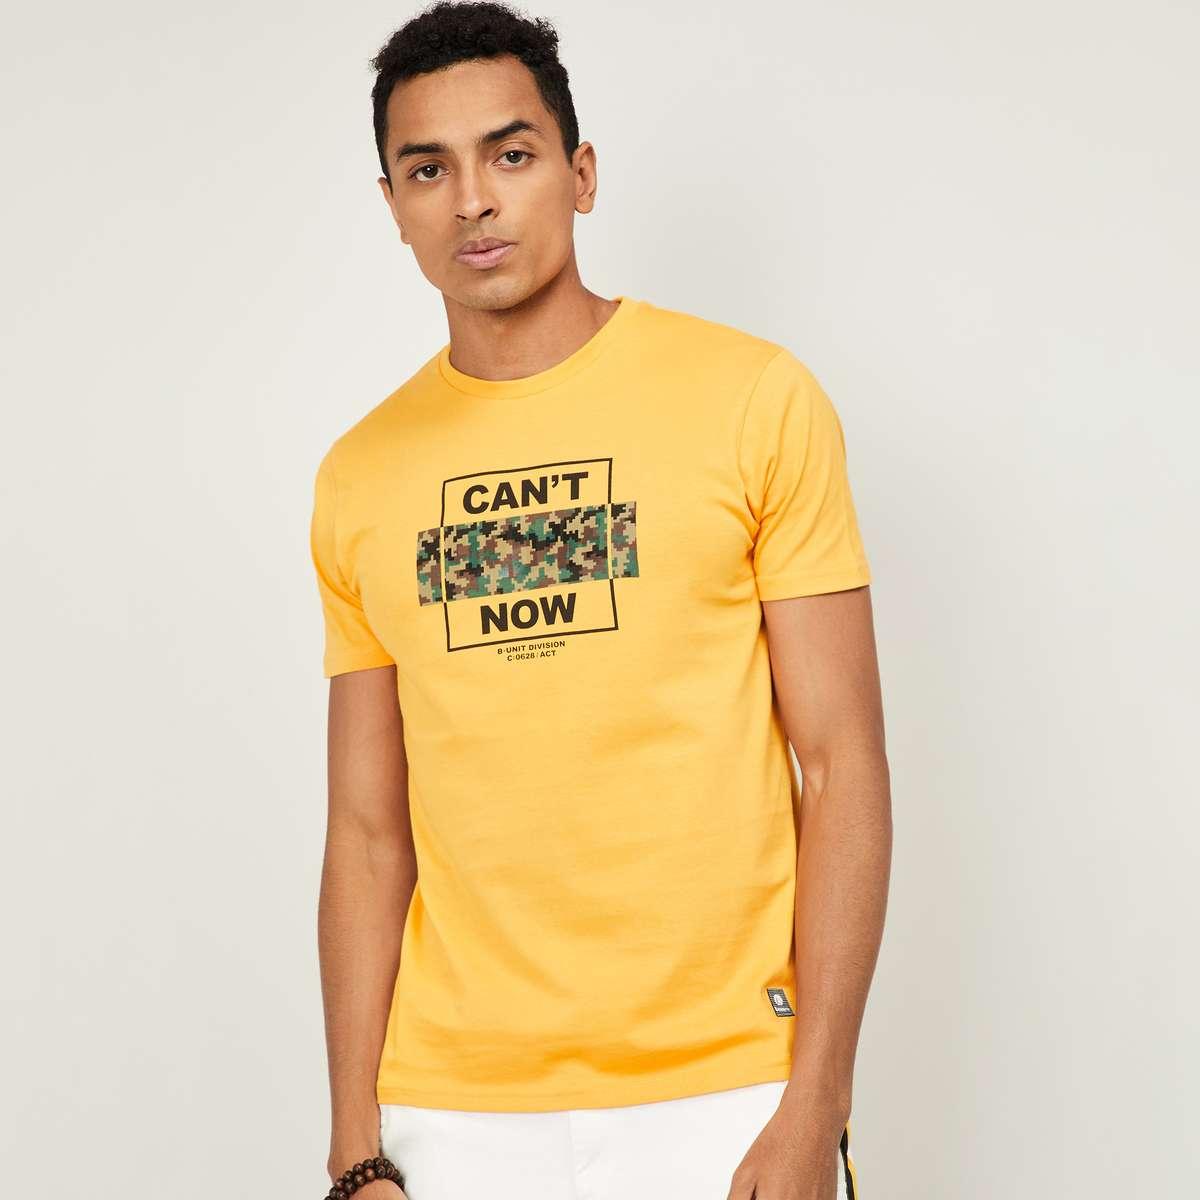 3.BOSSINI Men Typographic Print Regular Fit Crew Neck T-shirt